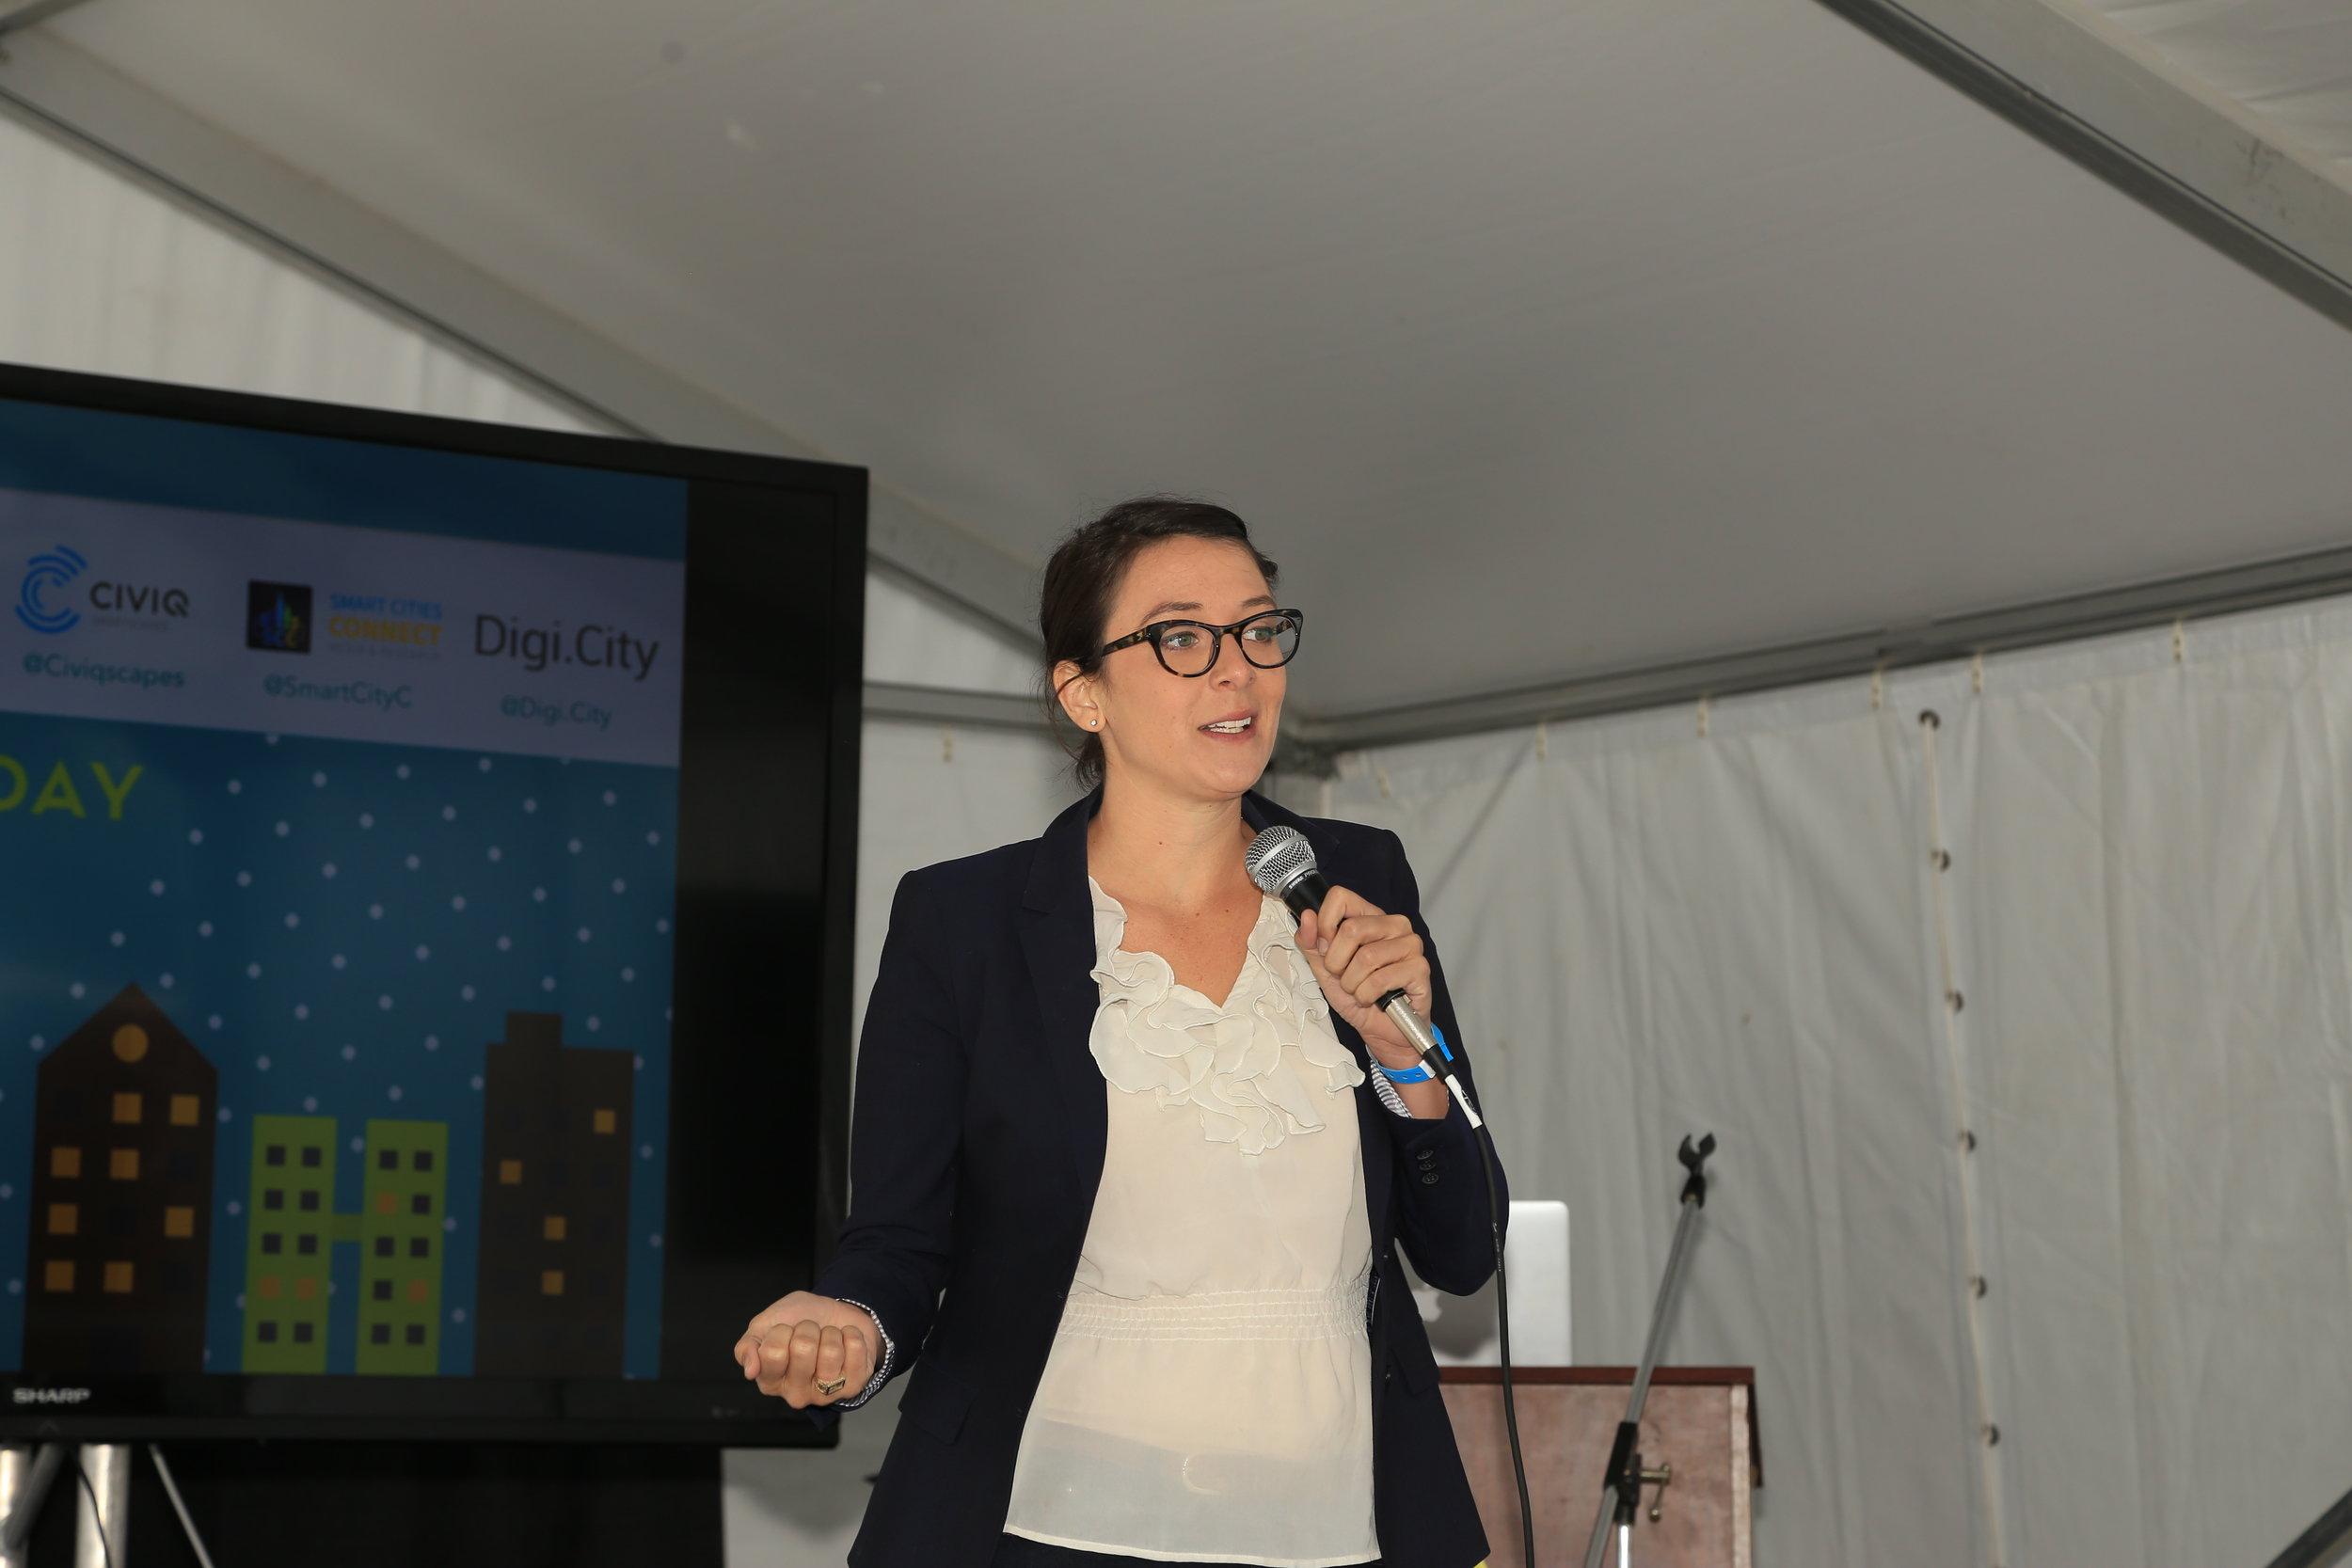 Carey Anne Nadeau, OpenData Nation